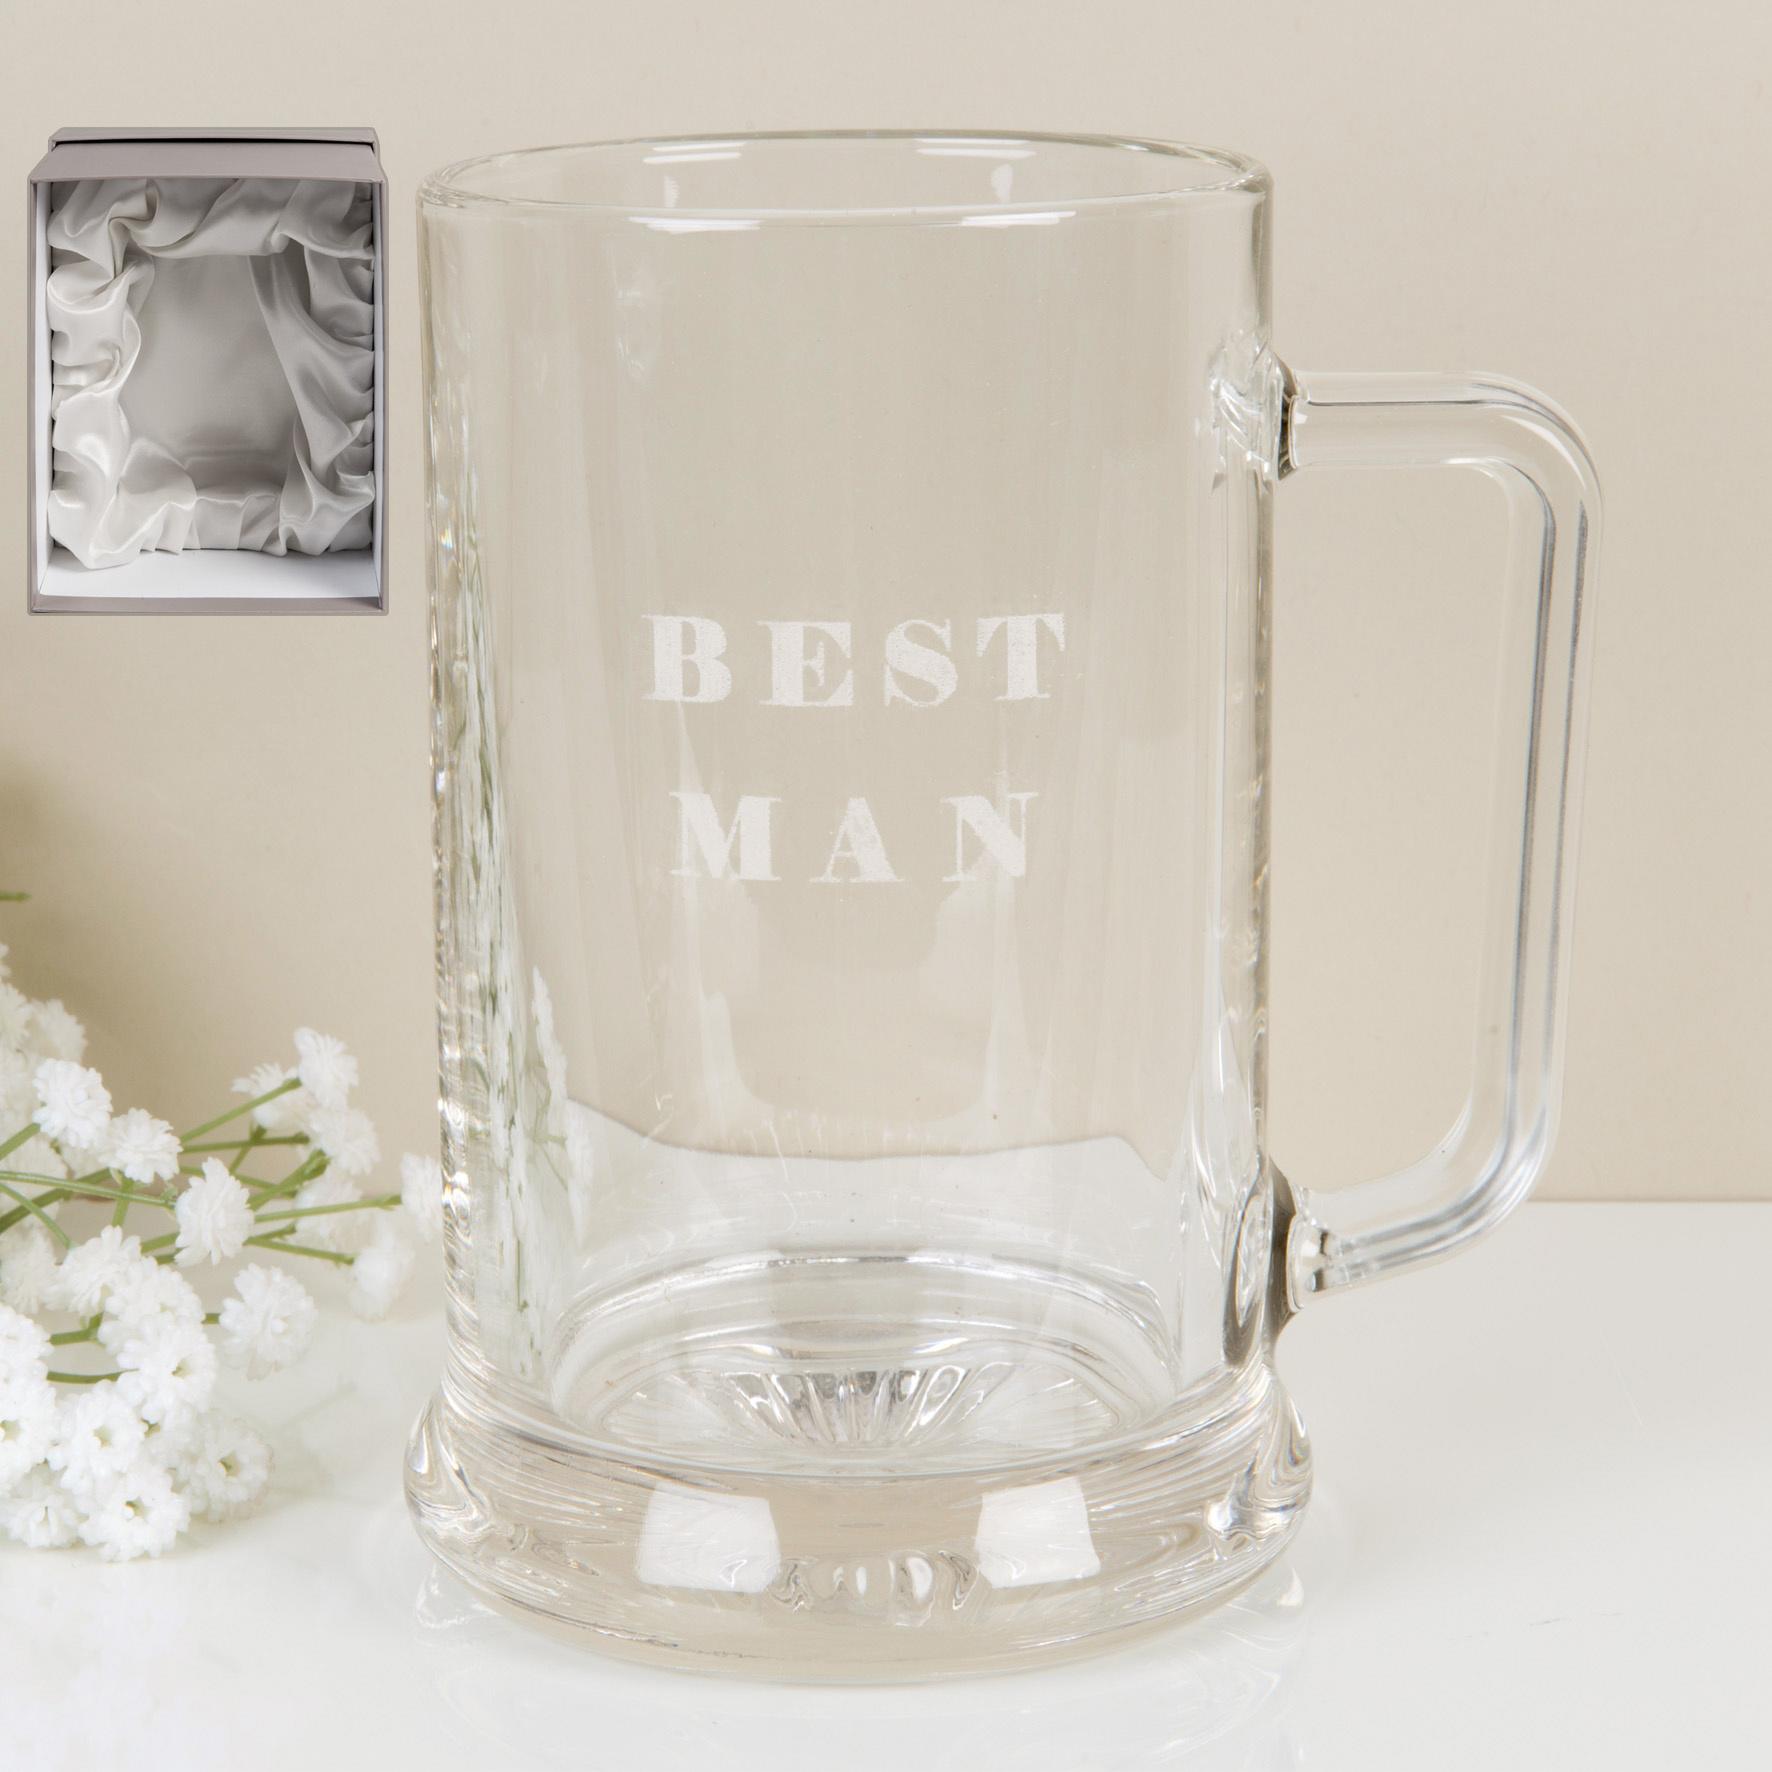 Best Man XL bierglas-1